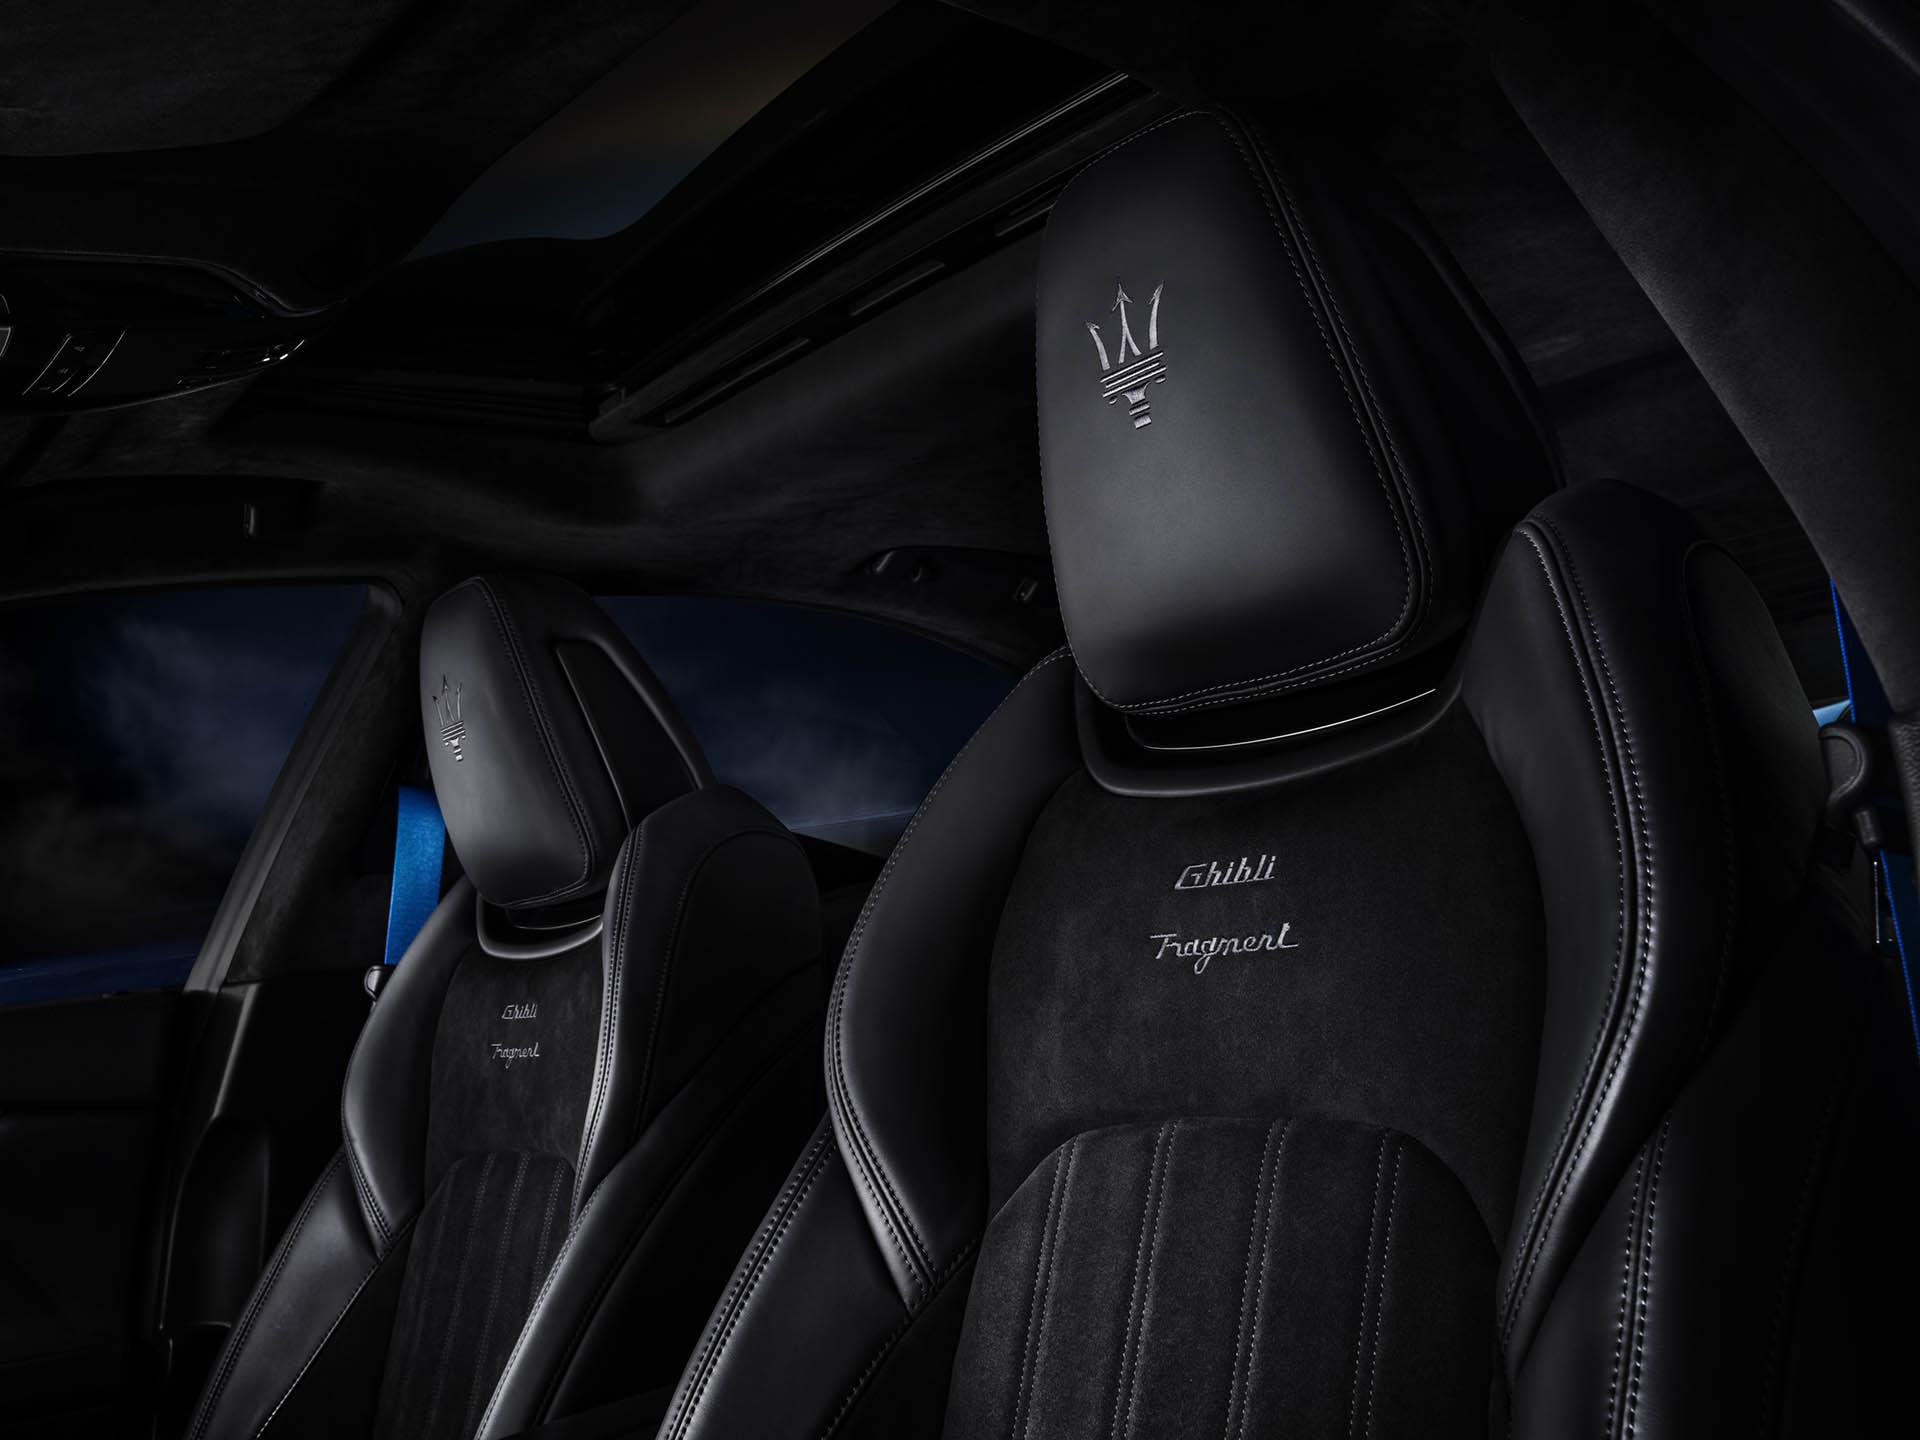 Maserati meets Fragment